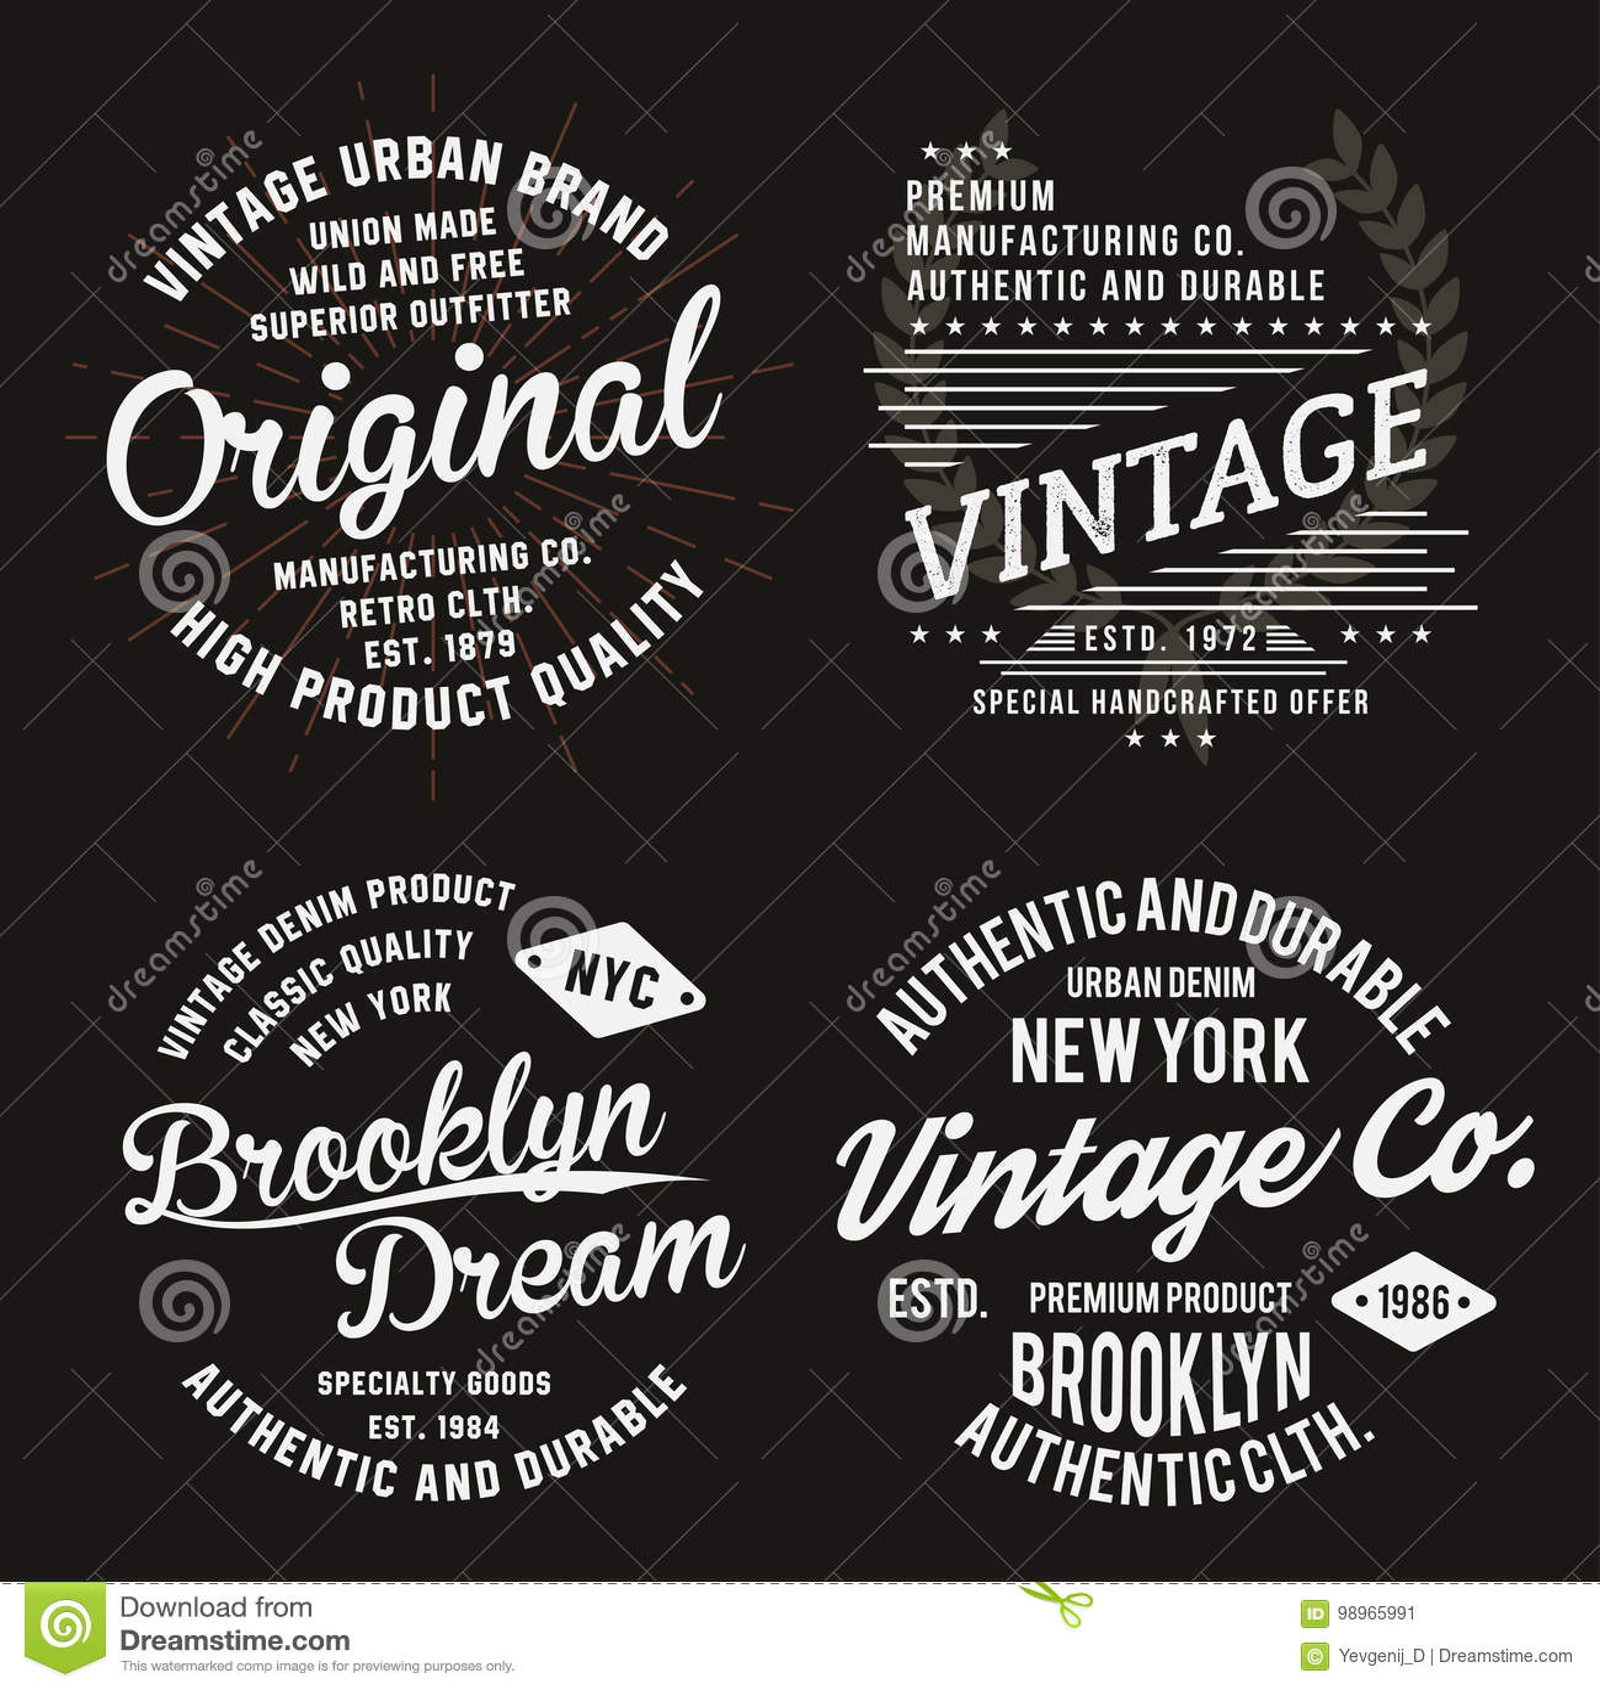 58d4246b Vintage typography for t-shirt print. Premium vintage t-shirt graphics set.